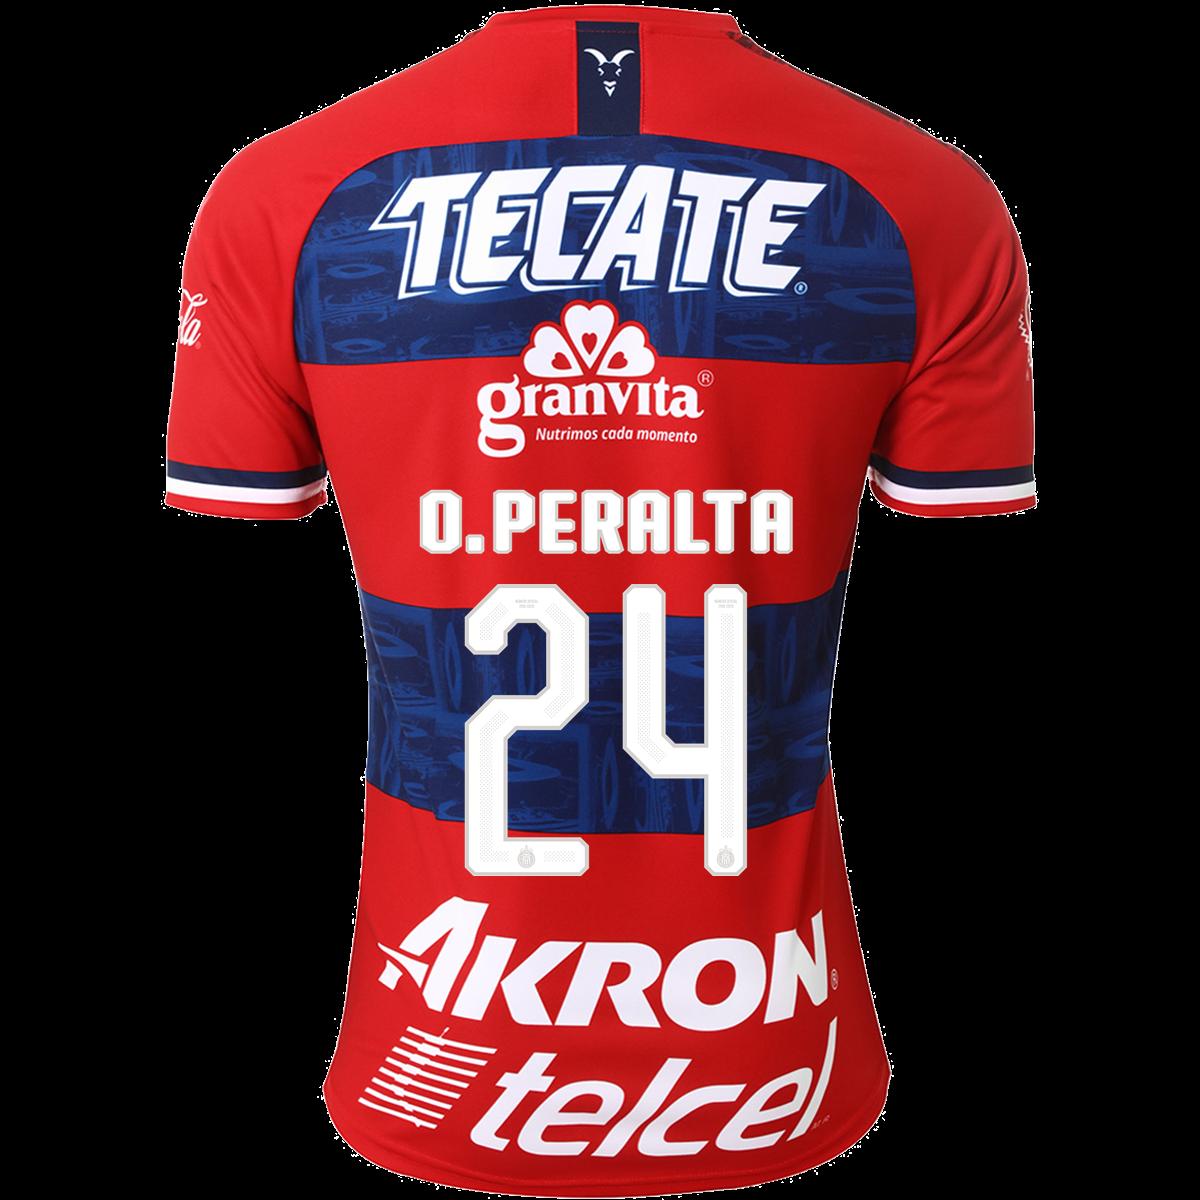 Puma Oribe Peralta Chivas Away Jersey 19 20 2xl Puma Cat Soccer Club America